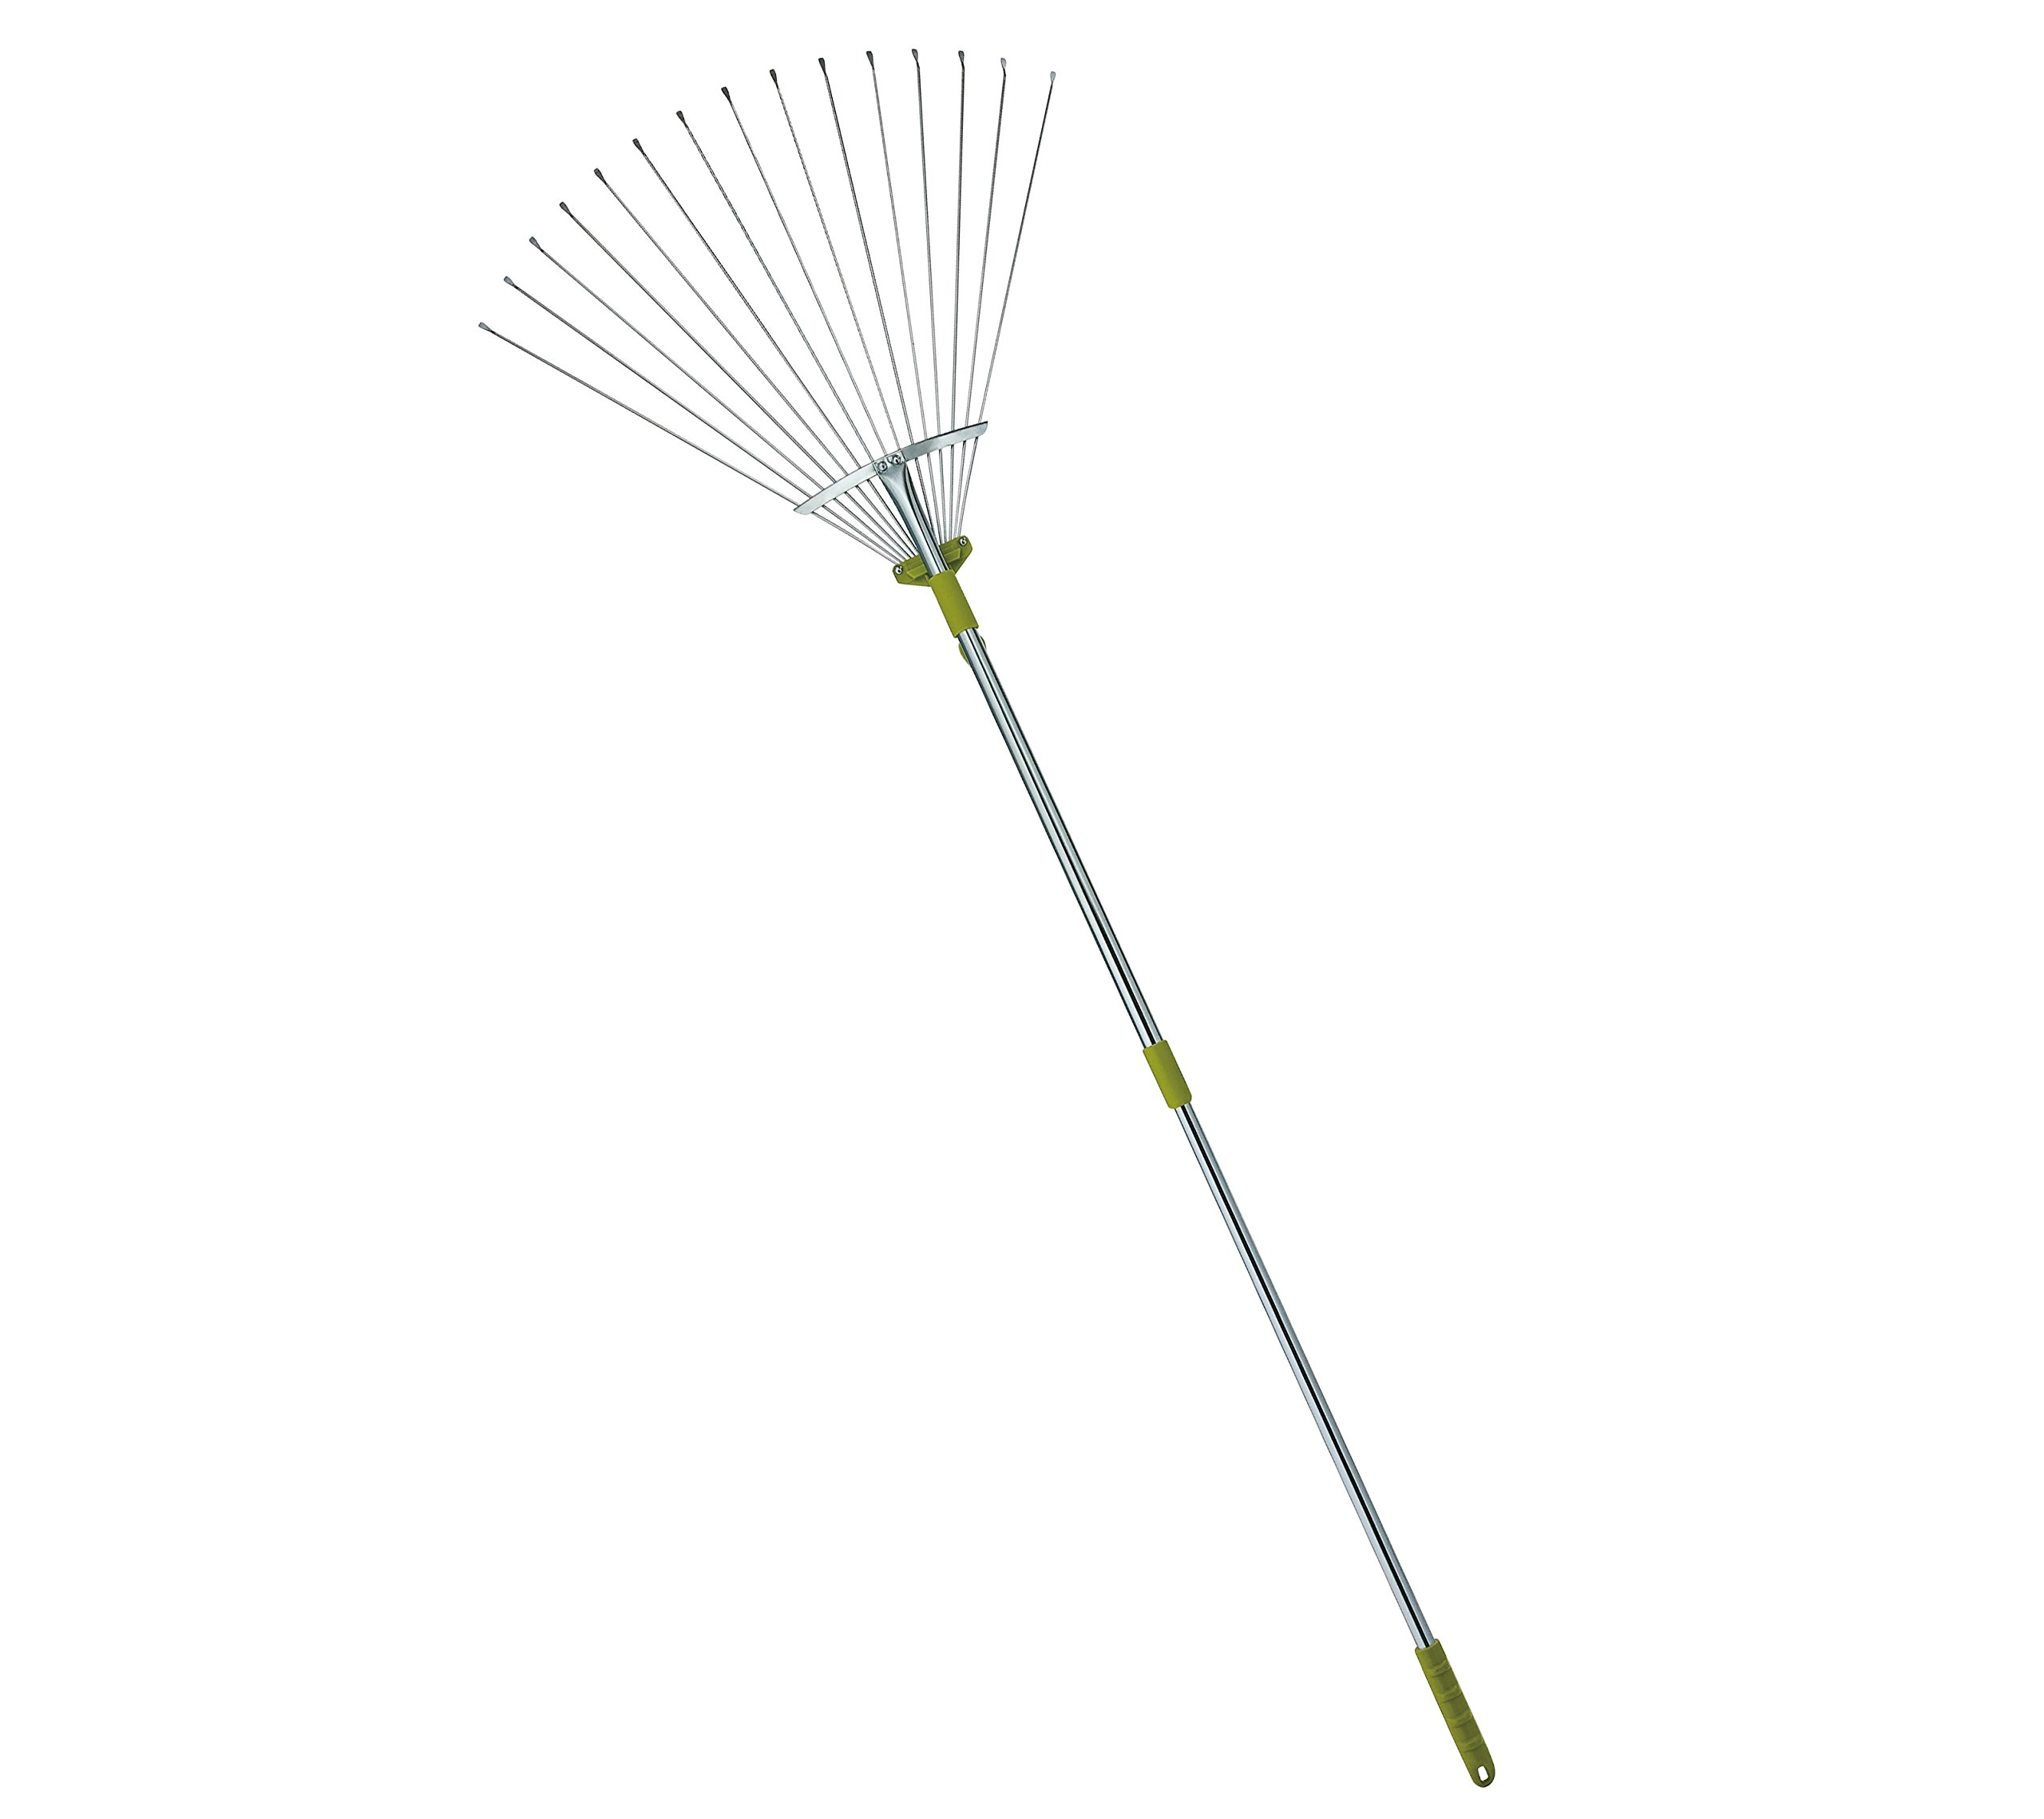 MLTOOLS 64-inch Adjustable Garden Leaf Rake - Flat Tine Adjustable Steel Rake with Extendable Handle R8236 - Special Offer!